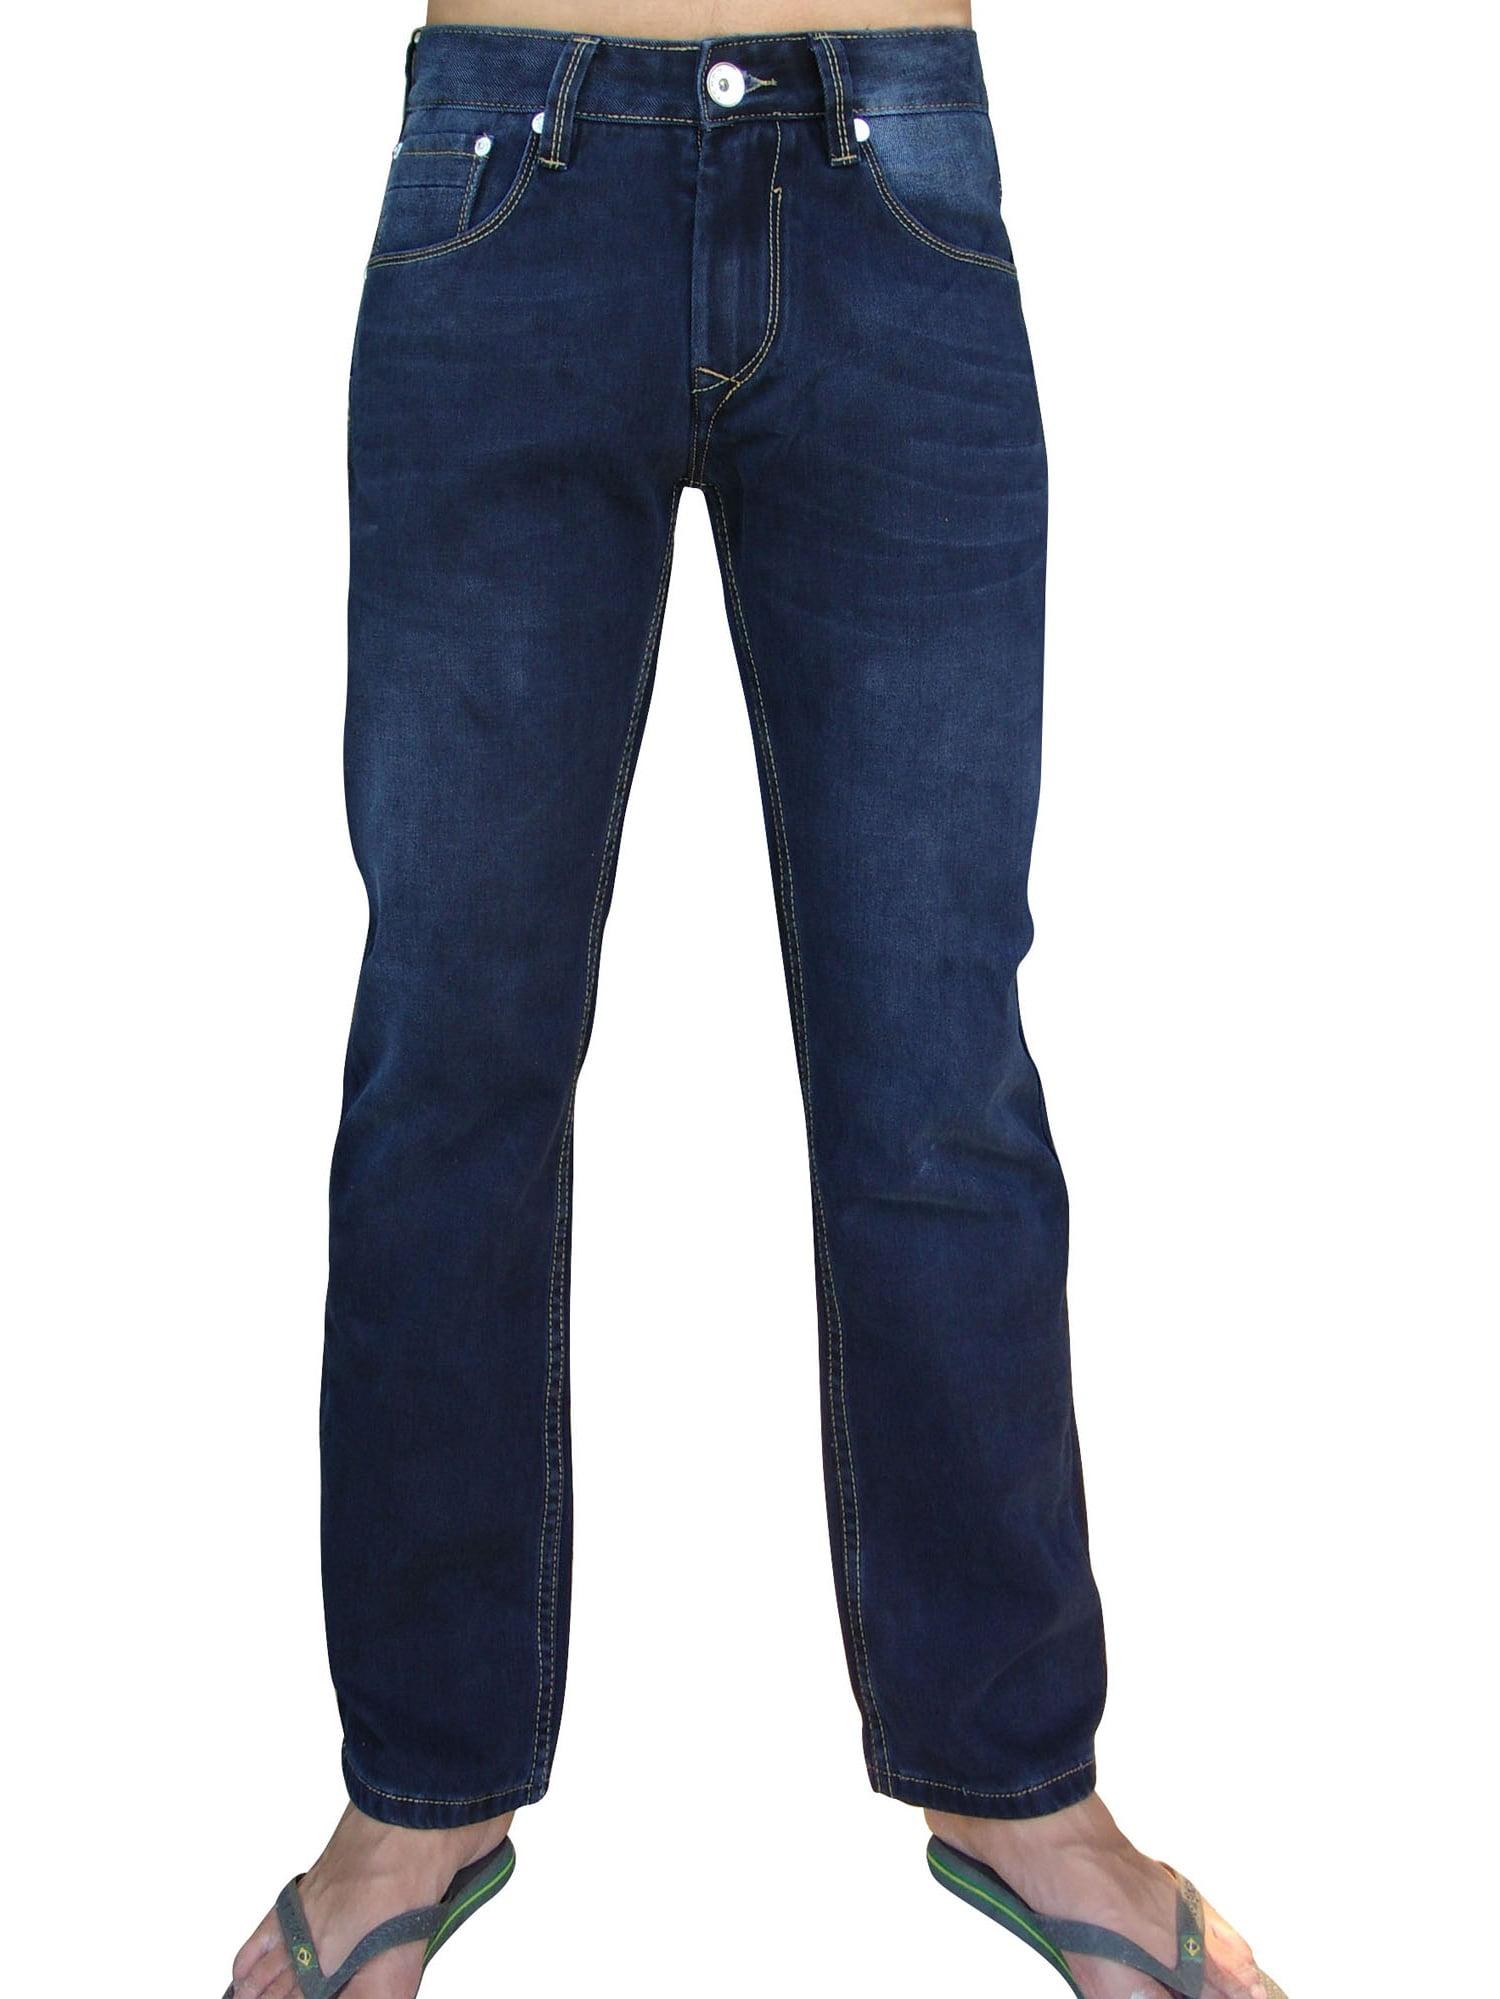 StoneTouch Men's Regular Fit Jeans 305-30s